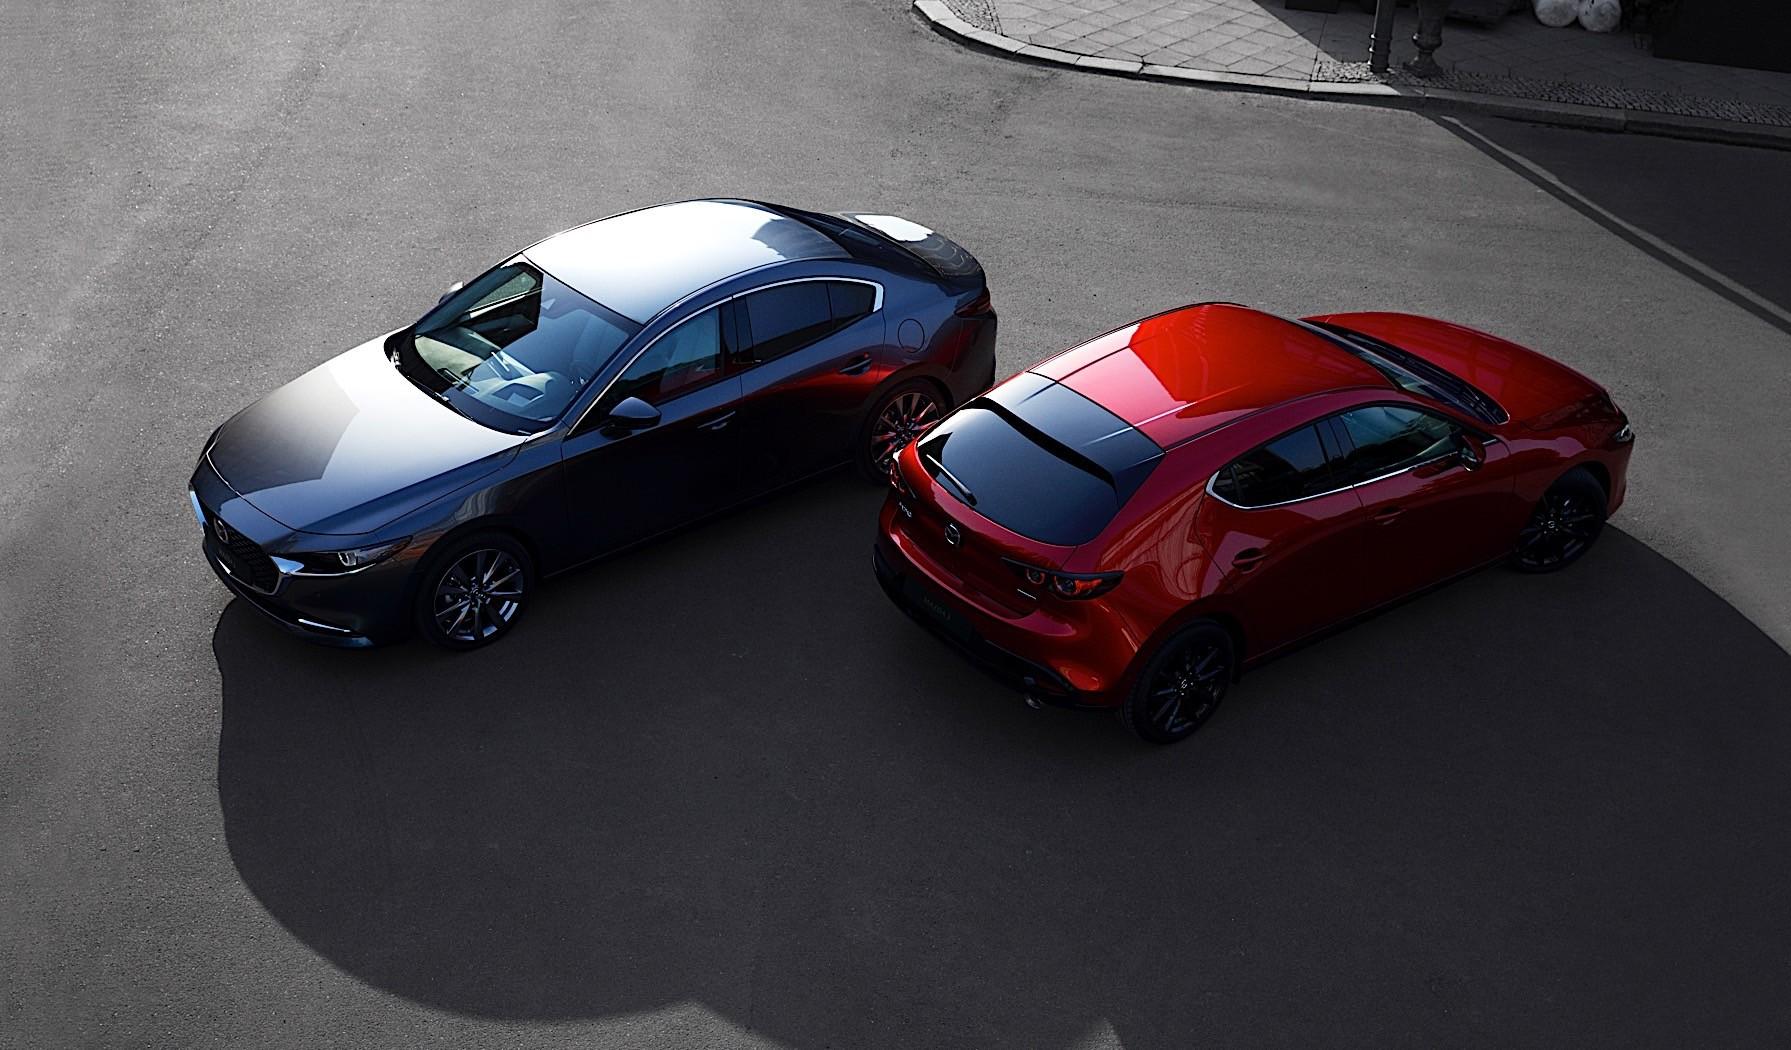 2020 Mazda3 Makes Triumphant Debut in Los Angeles - autoevolution